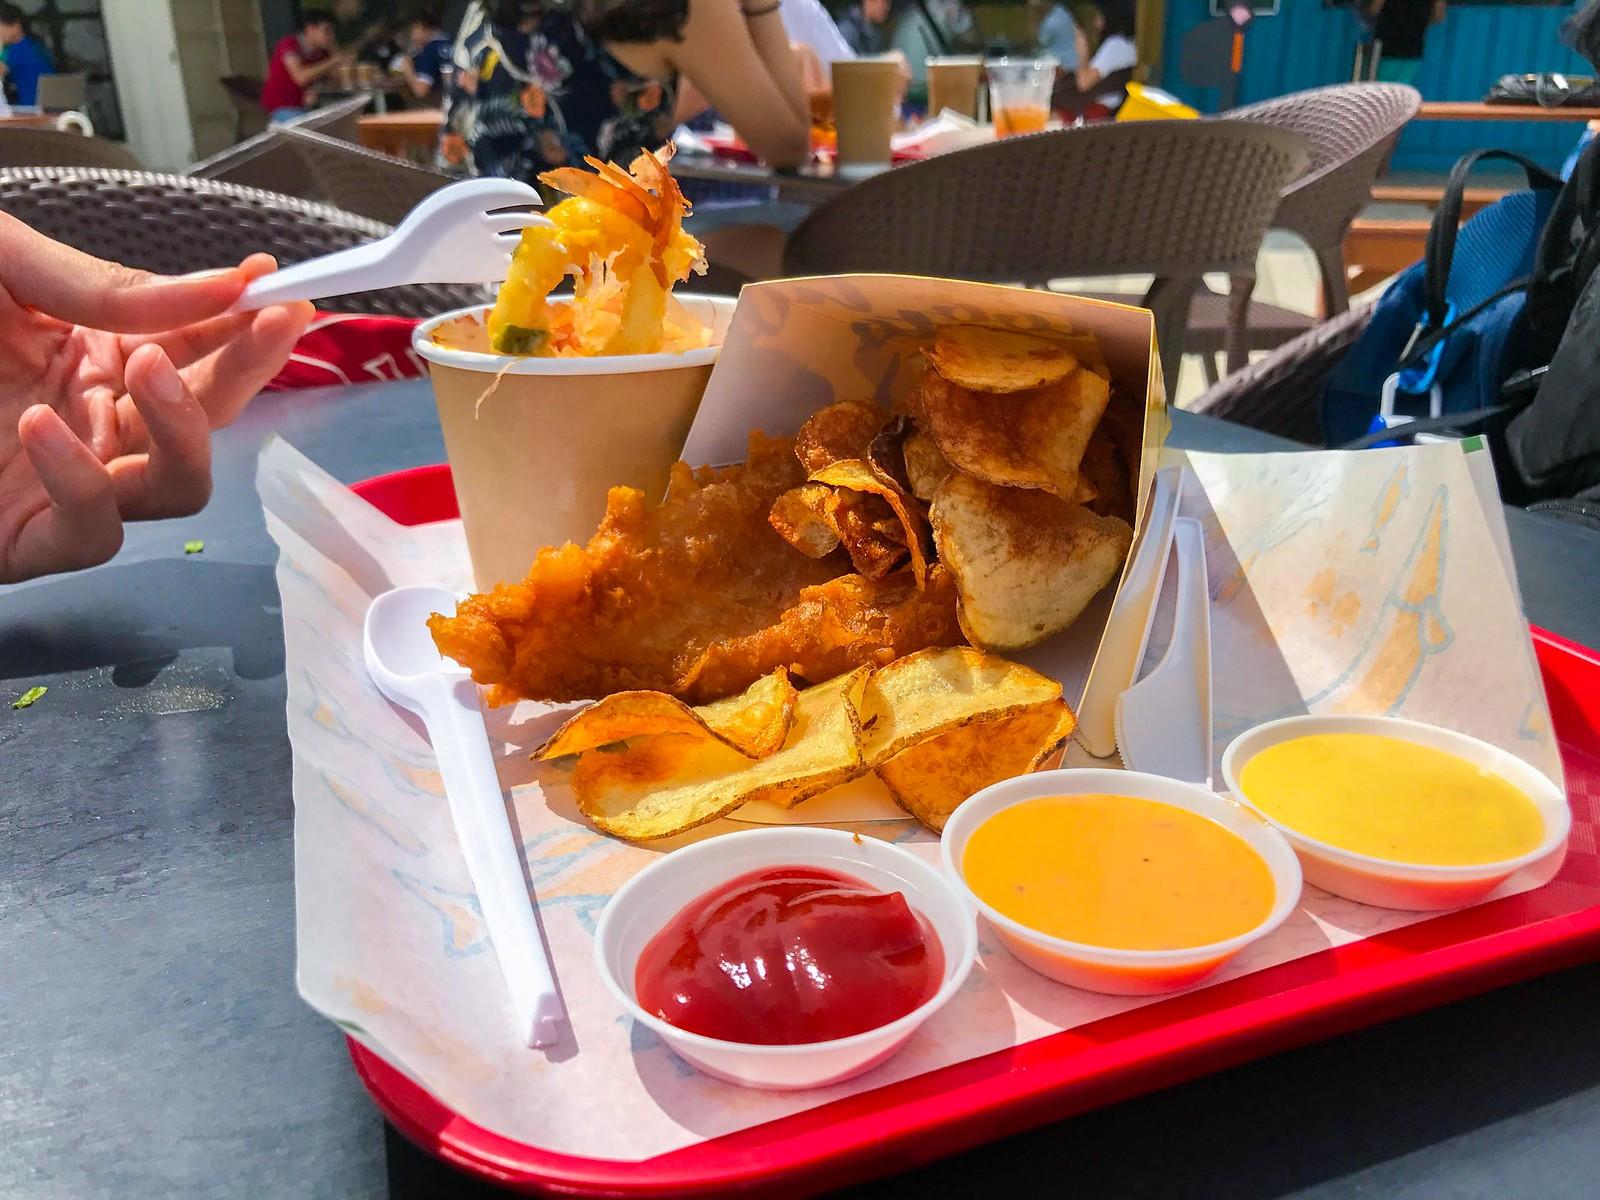 punggol-container-eateries-darrenbloggie-9